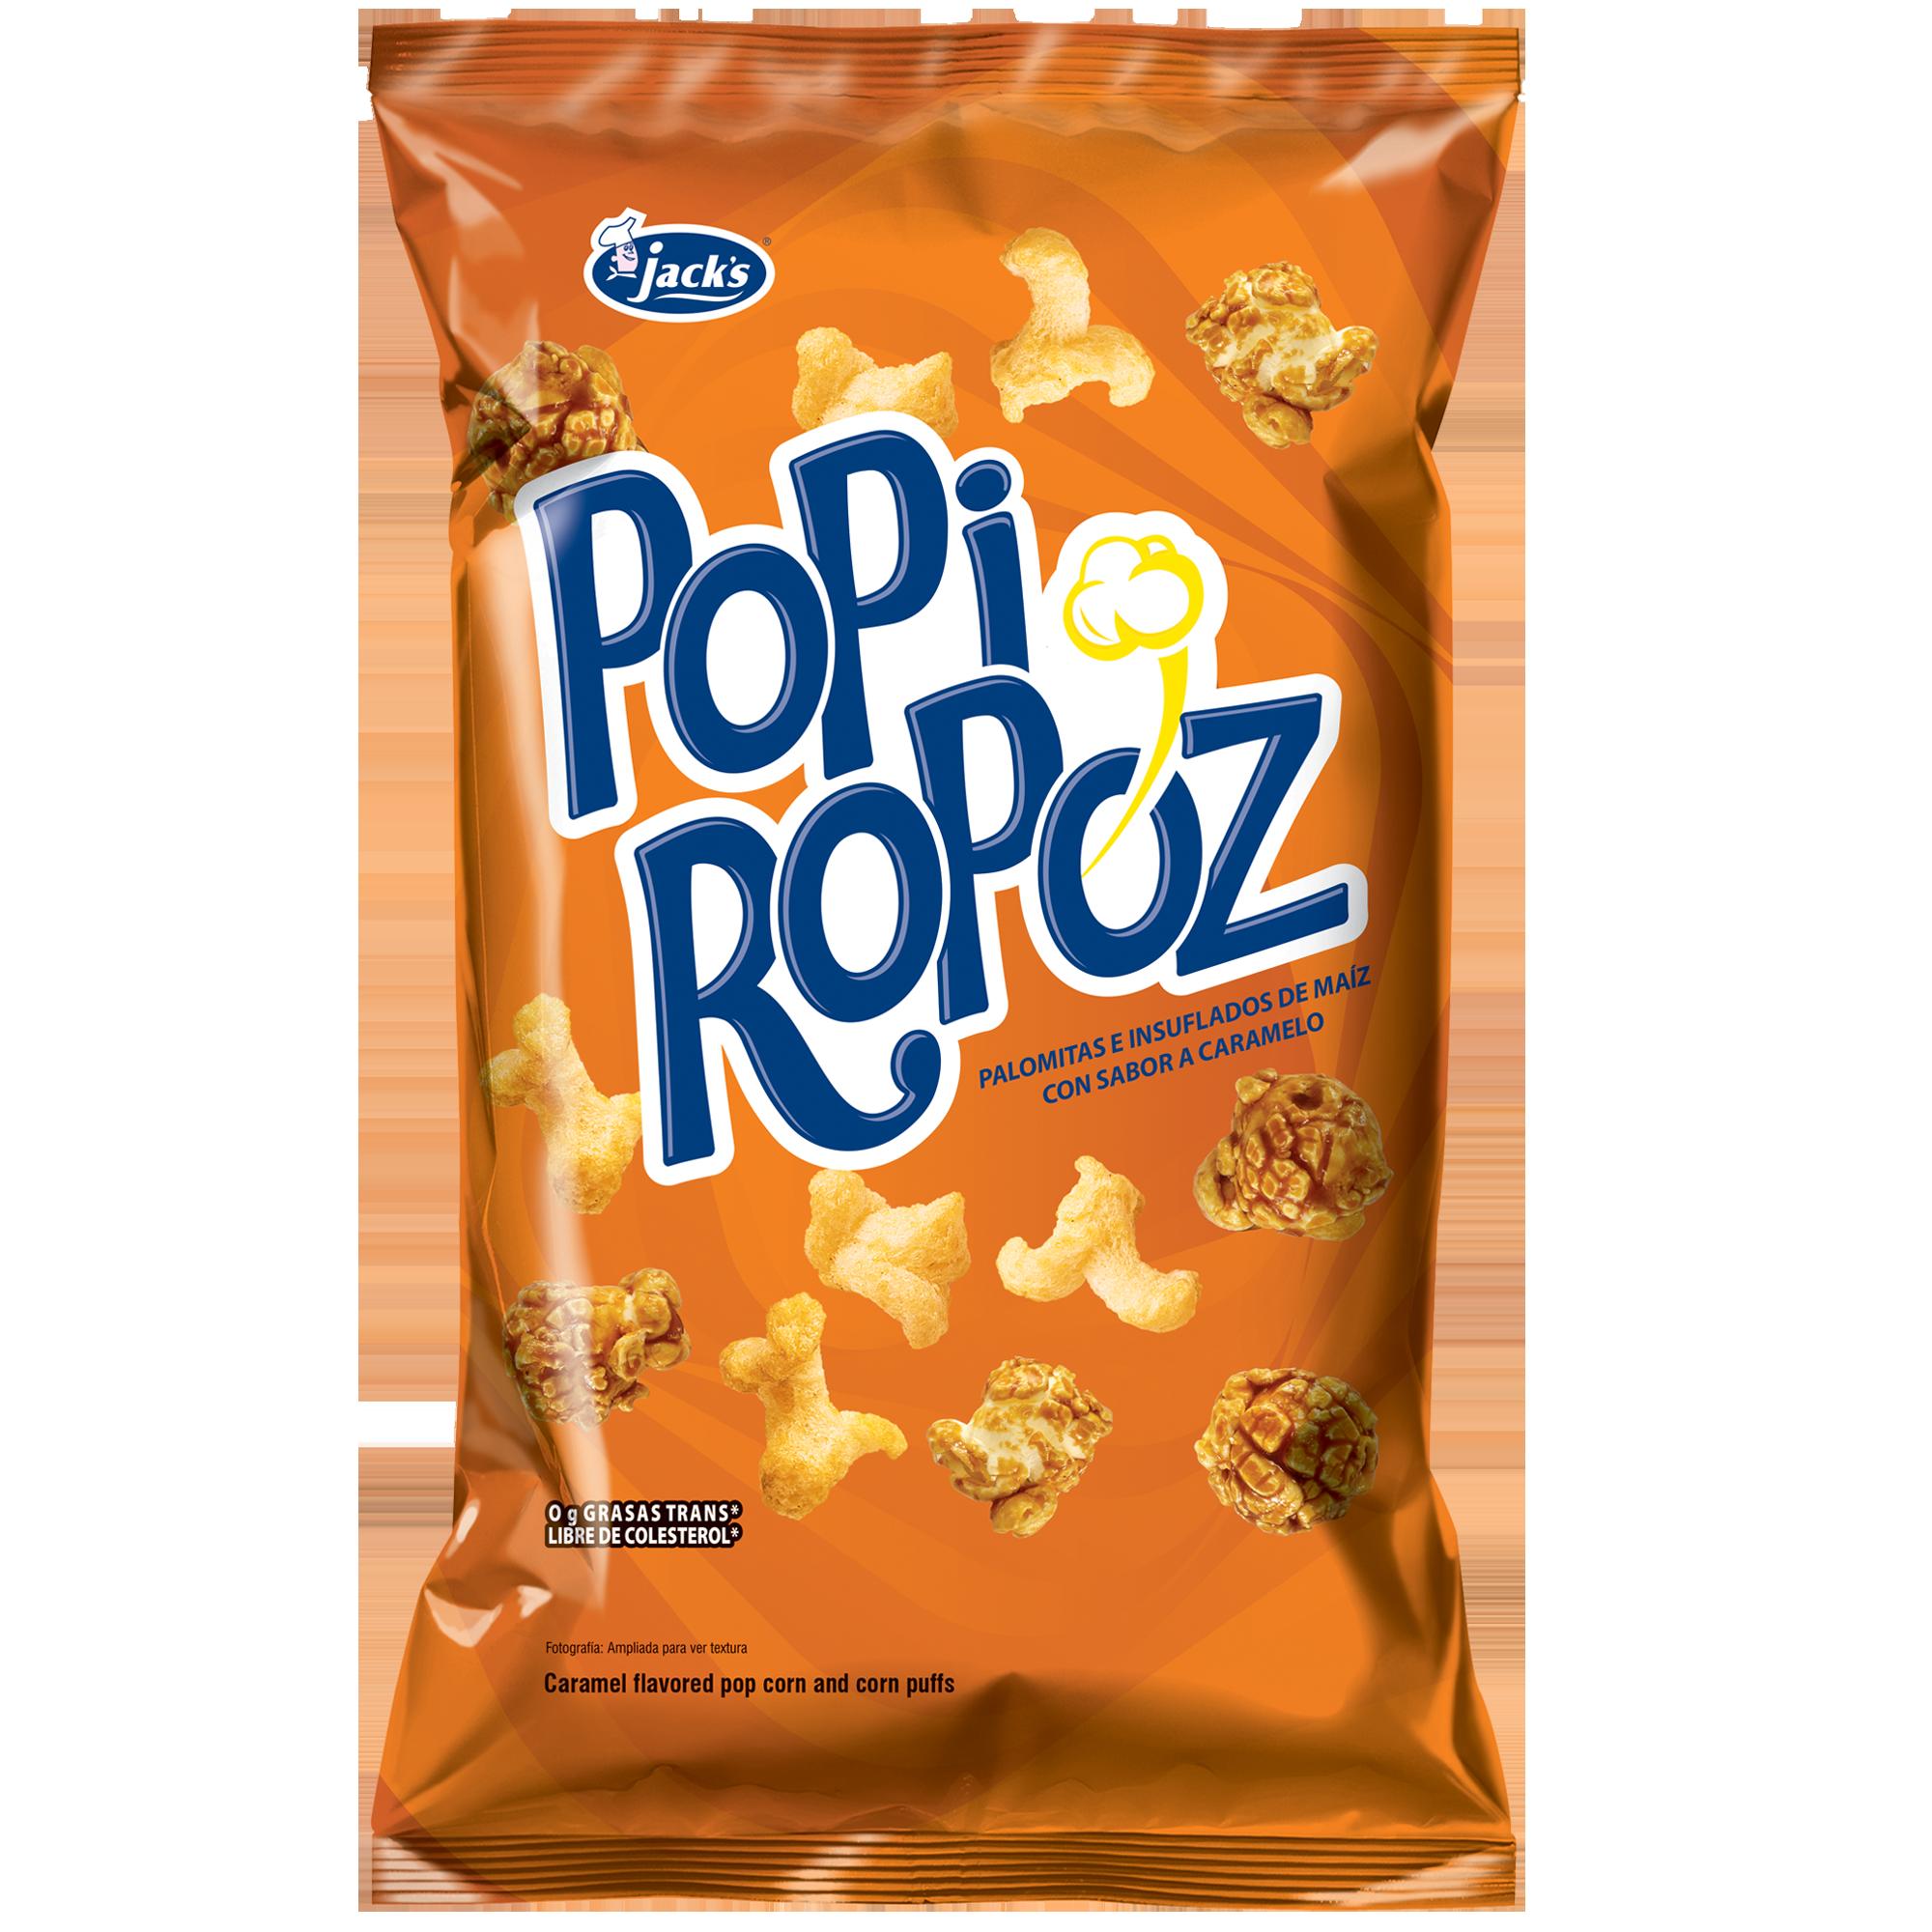 POPIROPOZ-indiv-presentac-pag-web